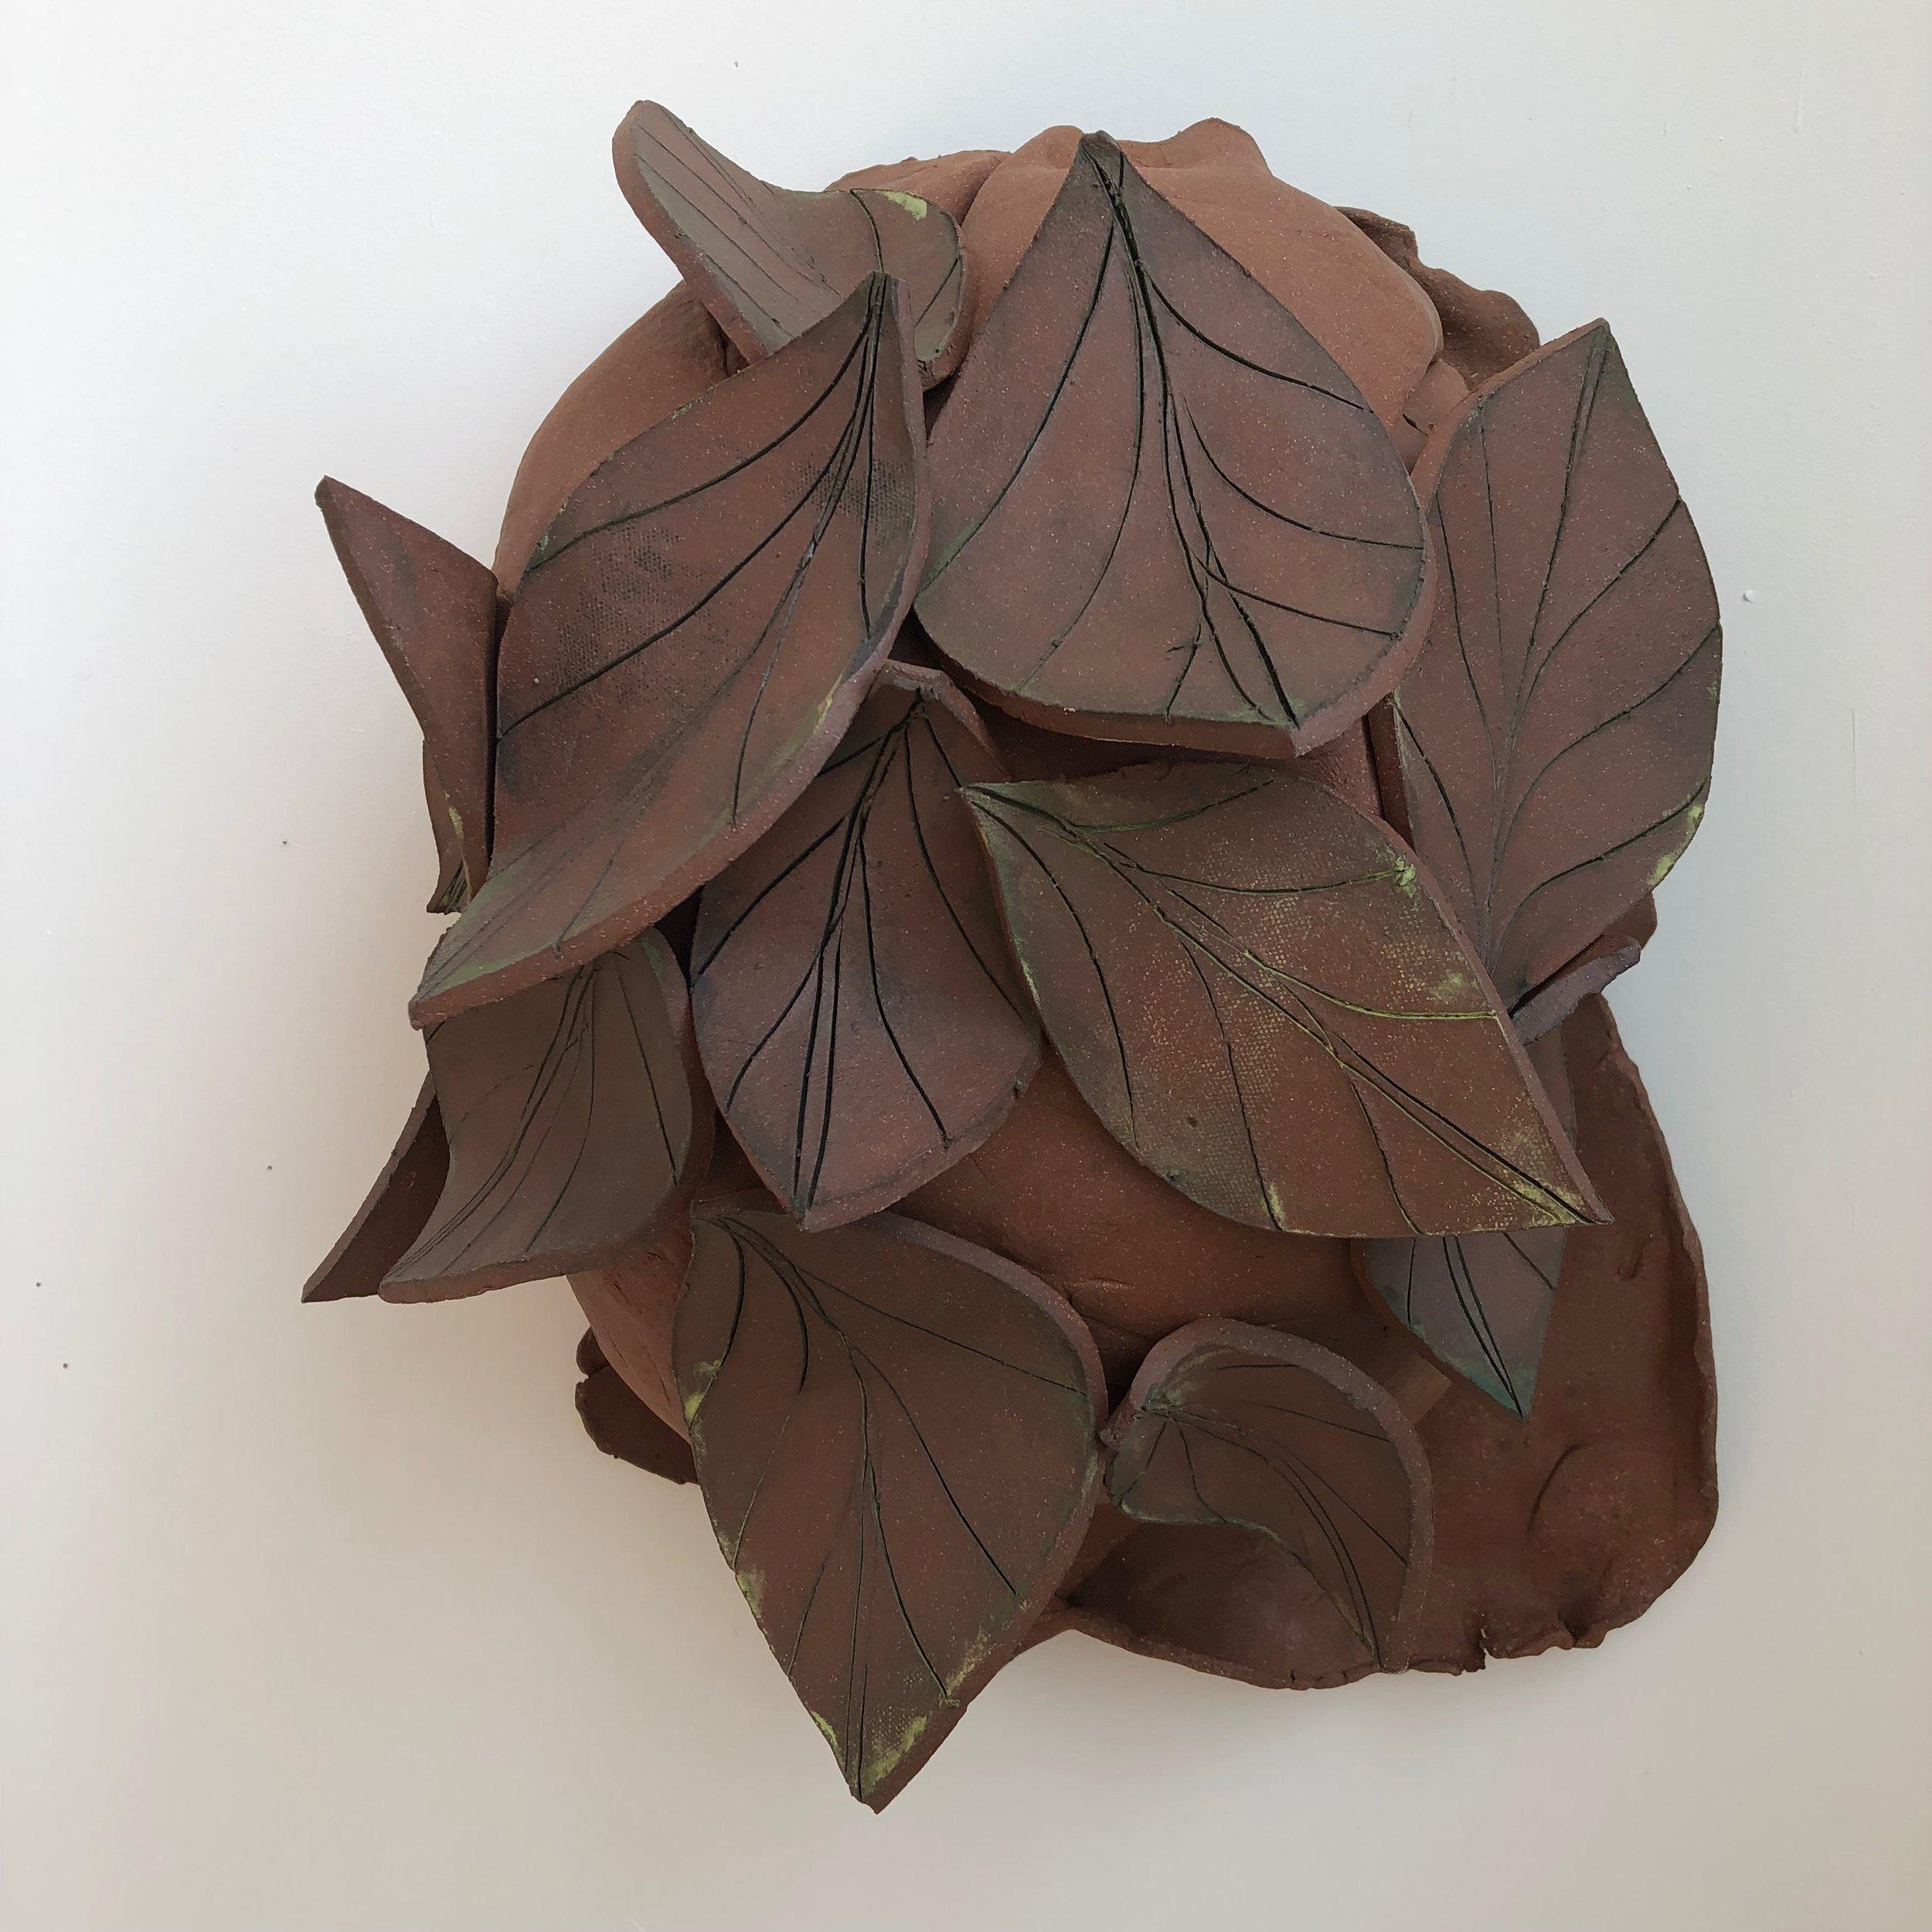 Untitled Belly, 2019, glazed ceramic, 15 x 12 x 9 inches